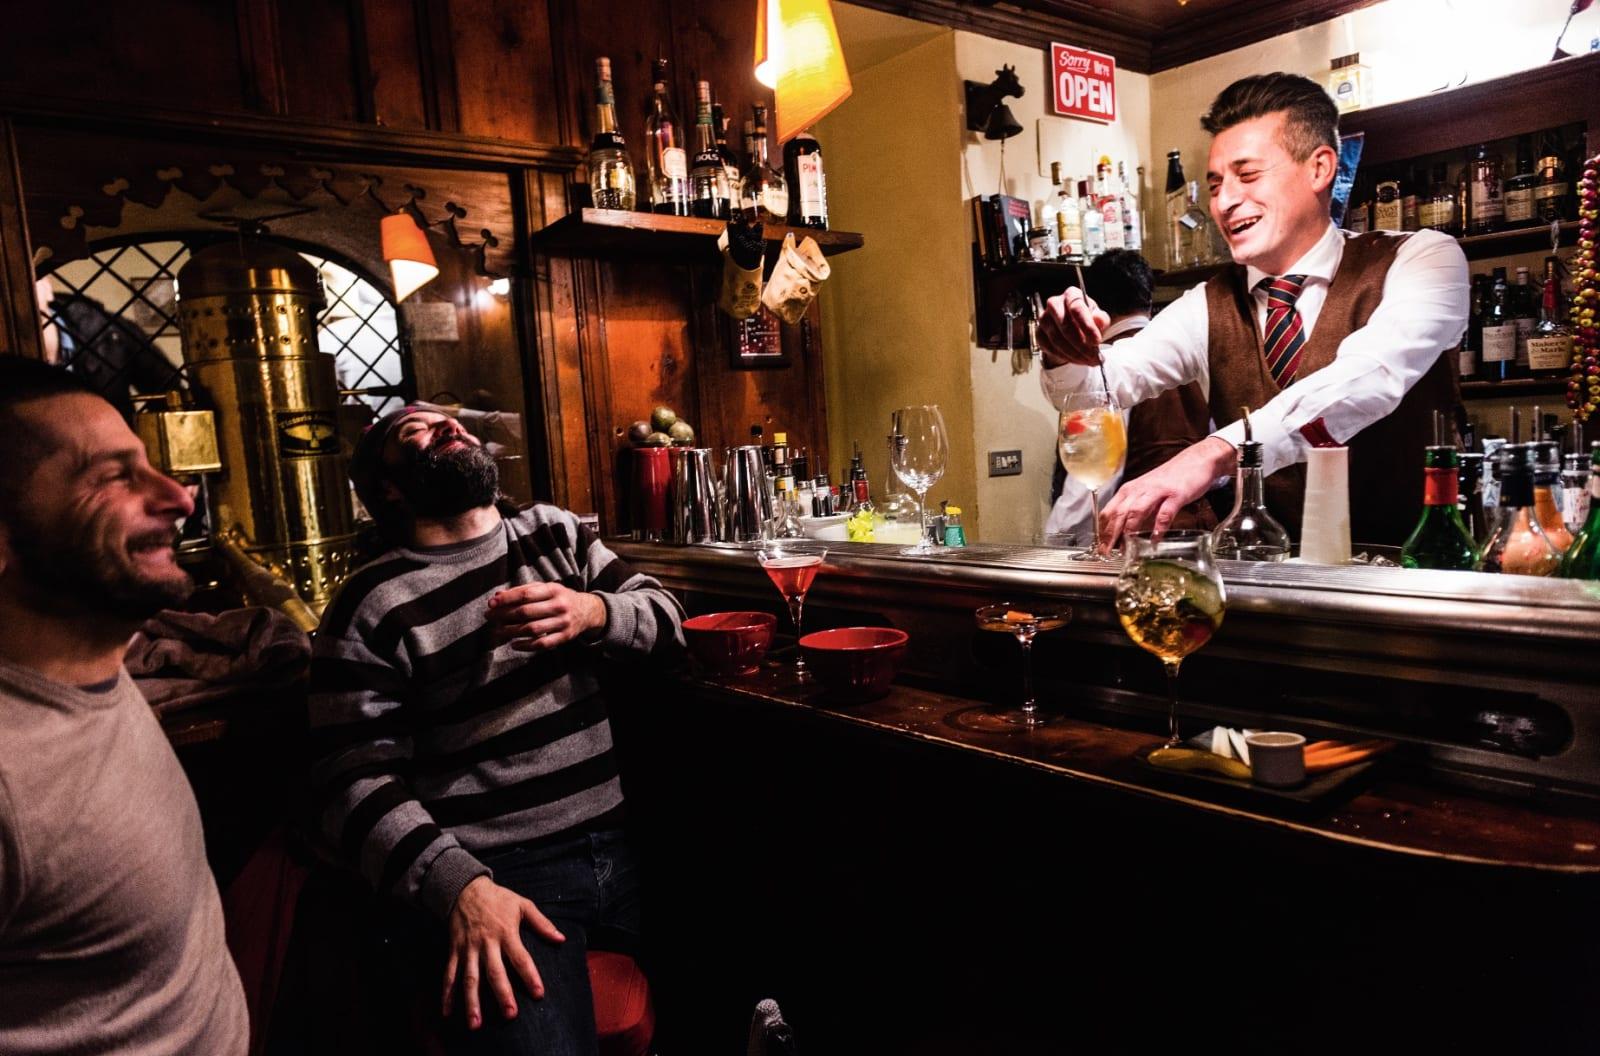 BAR: Privé er en trivelig cocktailbar i Courmayeur. Gode drinkar och koselig atmosfære